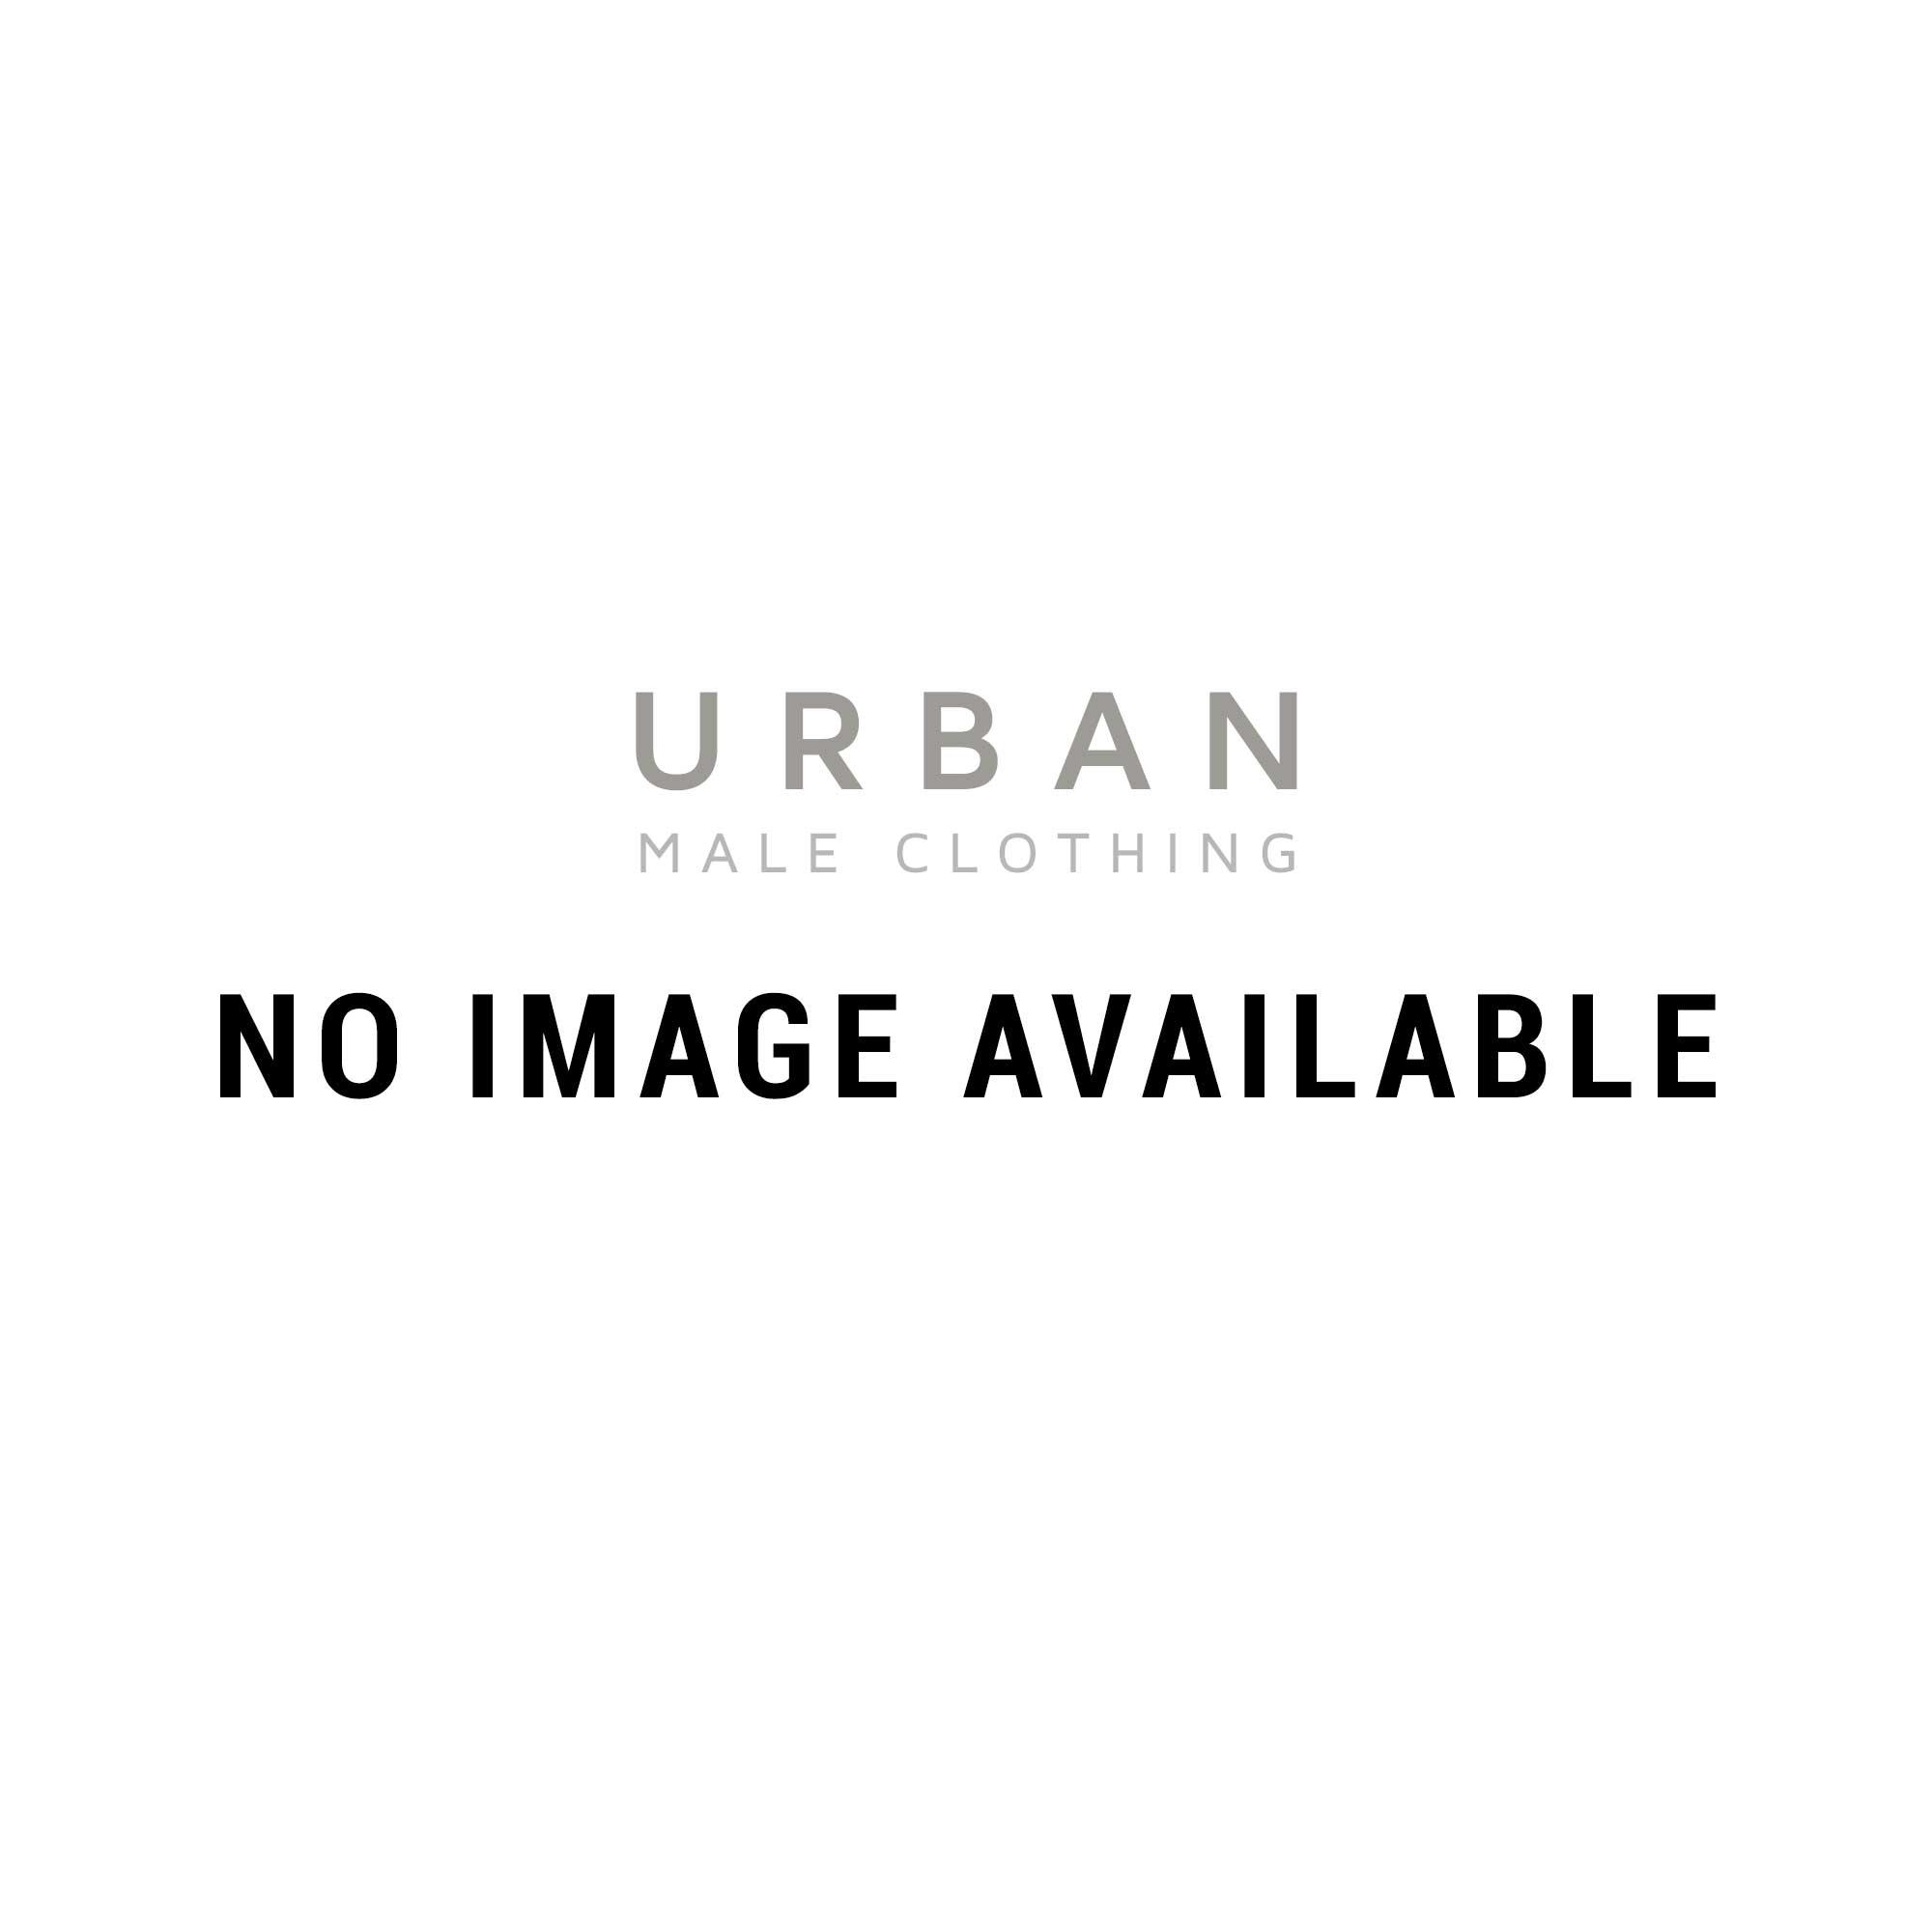 MK1 Settana Polo Shirt | Peacoat